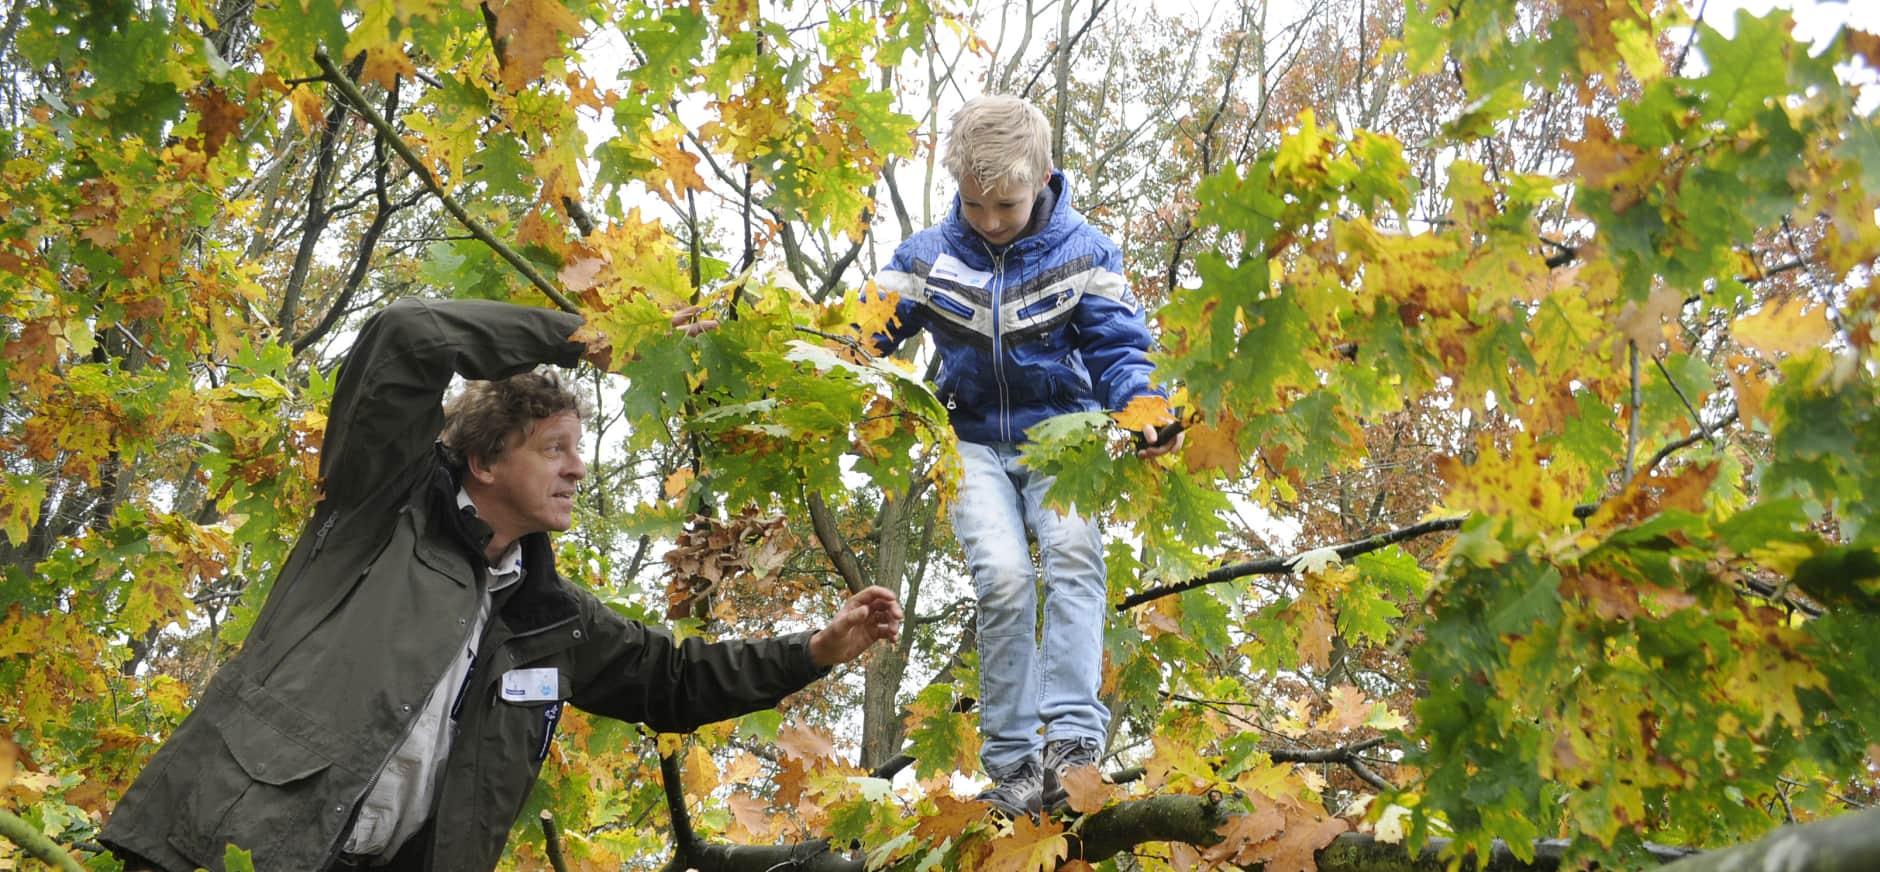 Vrijwilliger natuurbeheer Tienhovense plassen